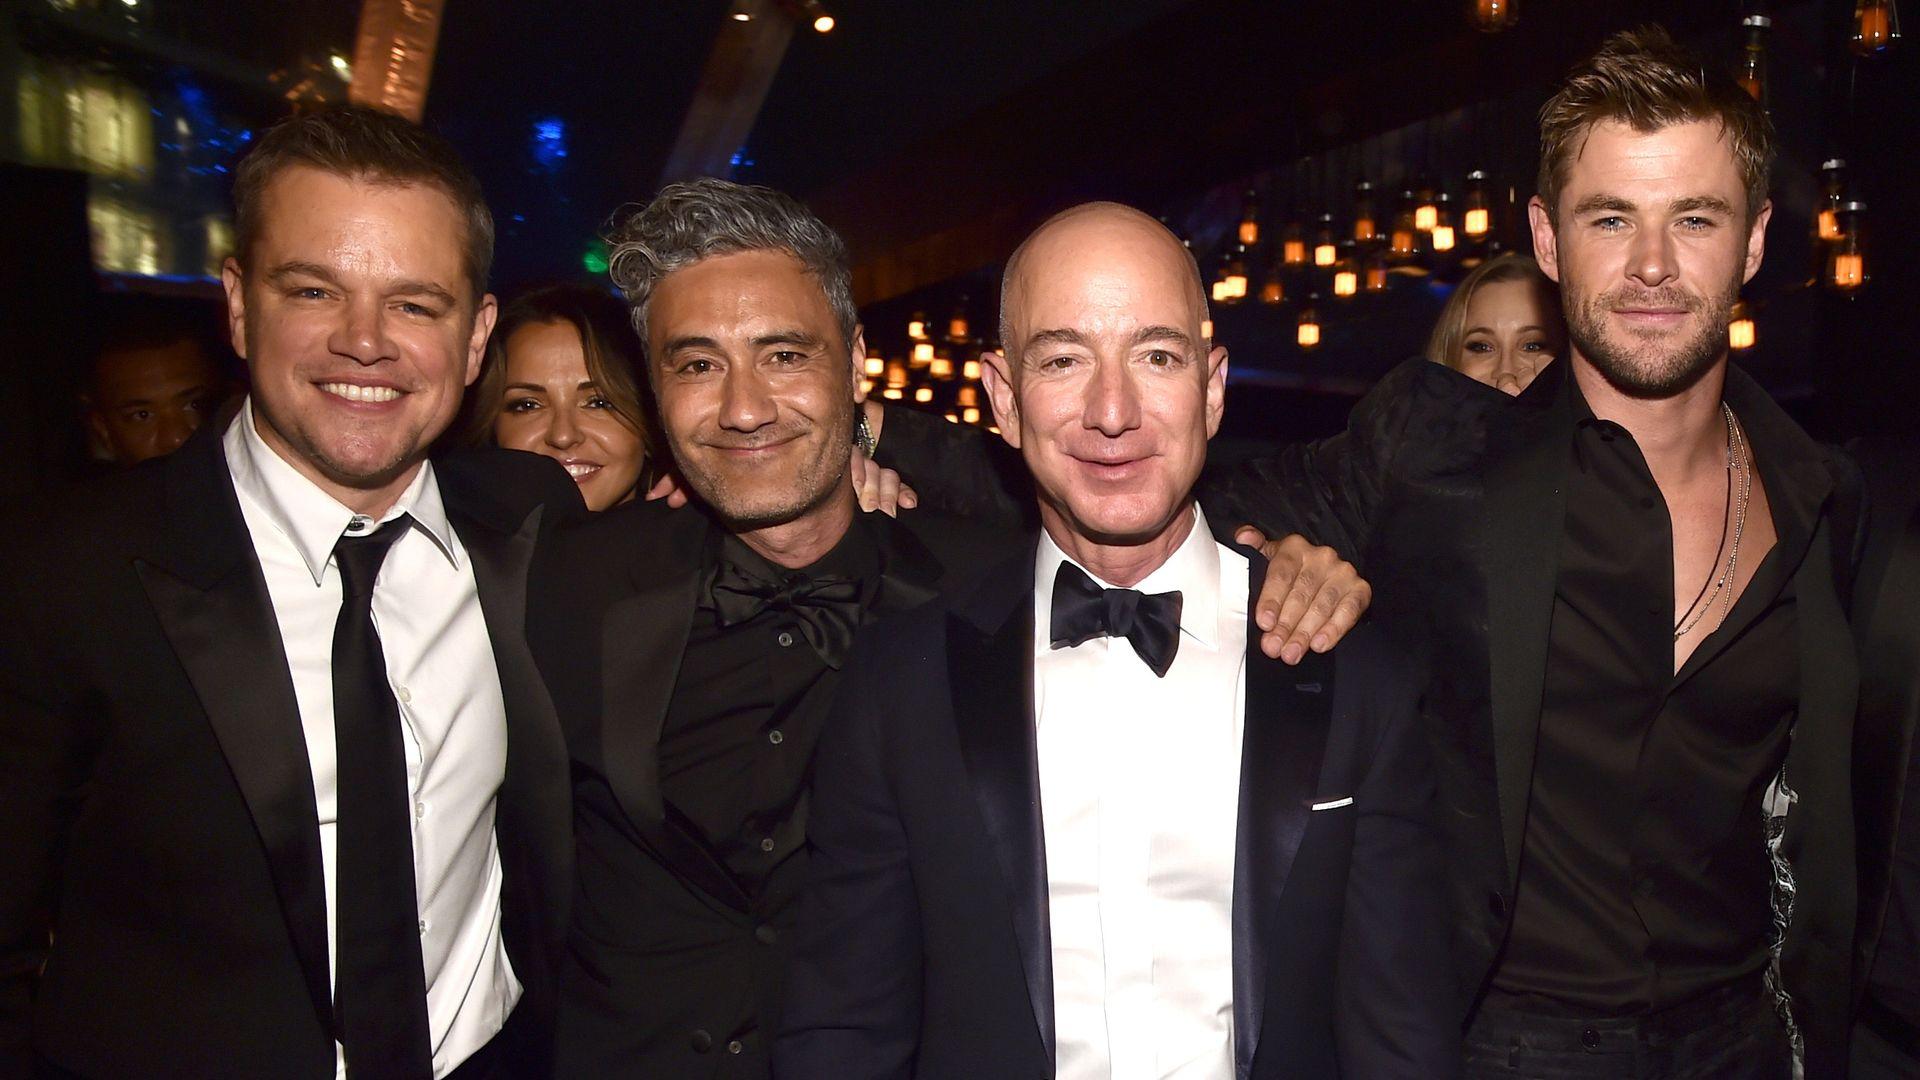 Jeff Bezos surrounded by Matt Damon, Taika Waititi and Chris Hemsworth at a Golden Globes party